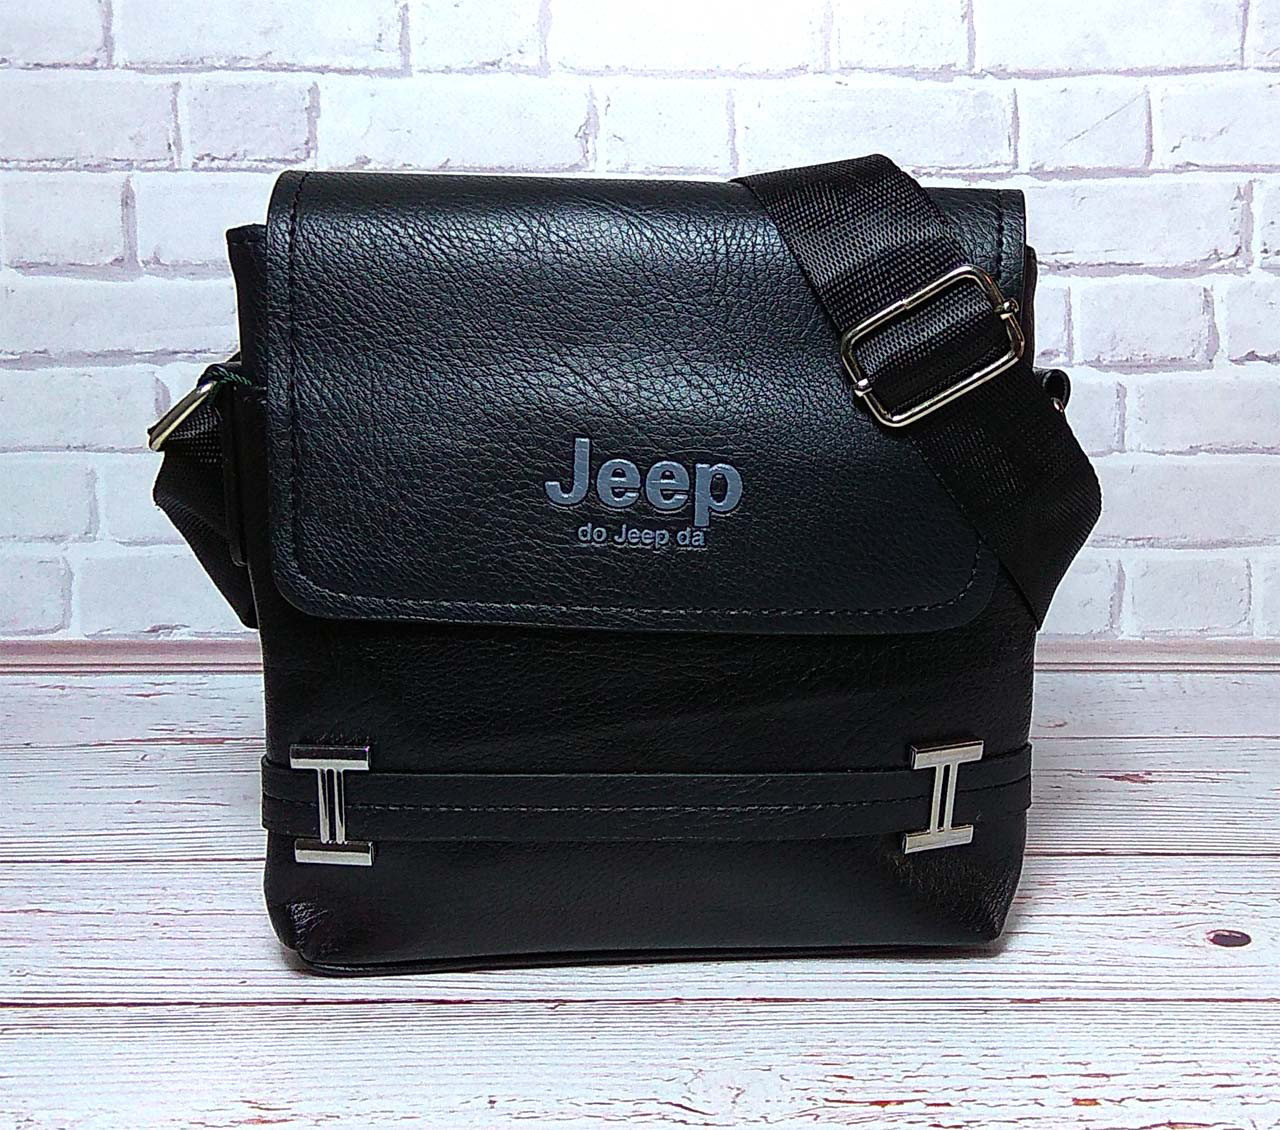 Мужская сумка через плечо Jeep. Черная. 21см х 19см / Кожа PU. 554 black